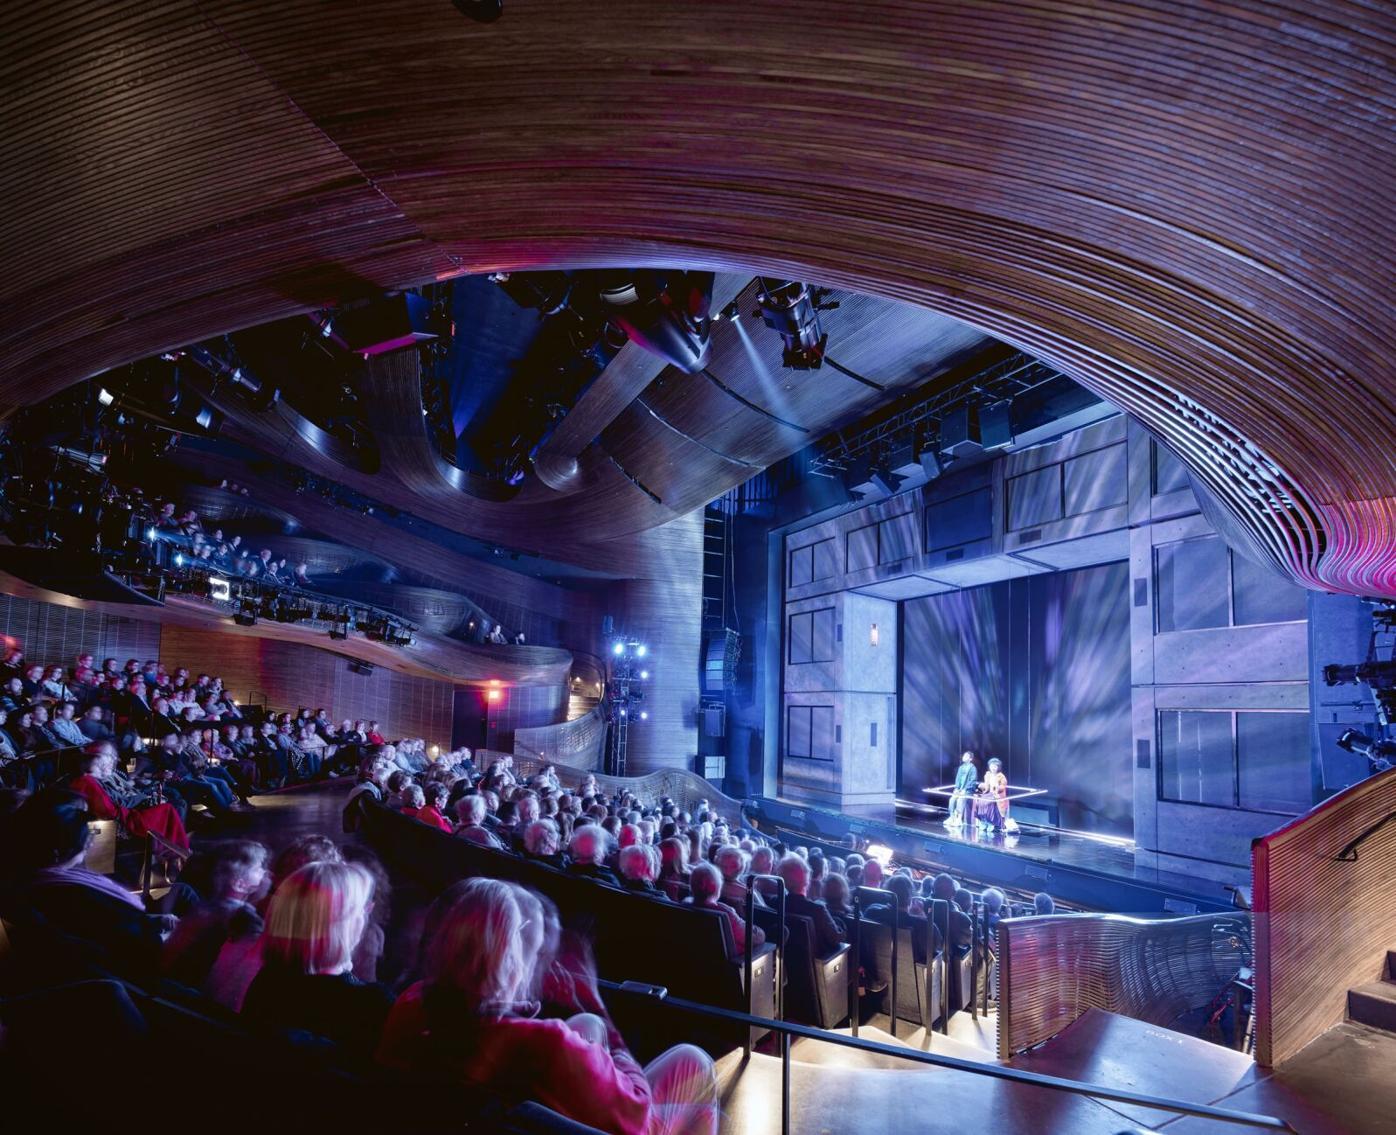 061621_MNS_Alliance_2021-22_001 Alliance Theatre Coca-Cola Stage